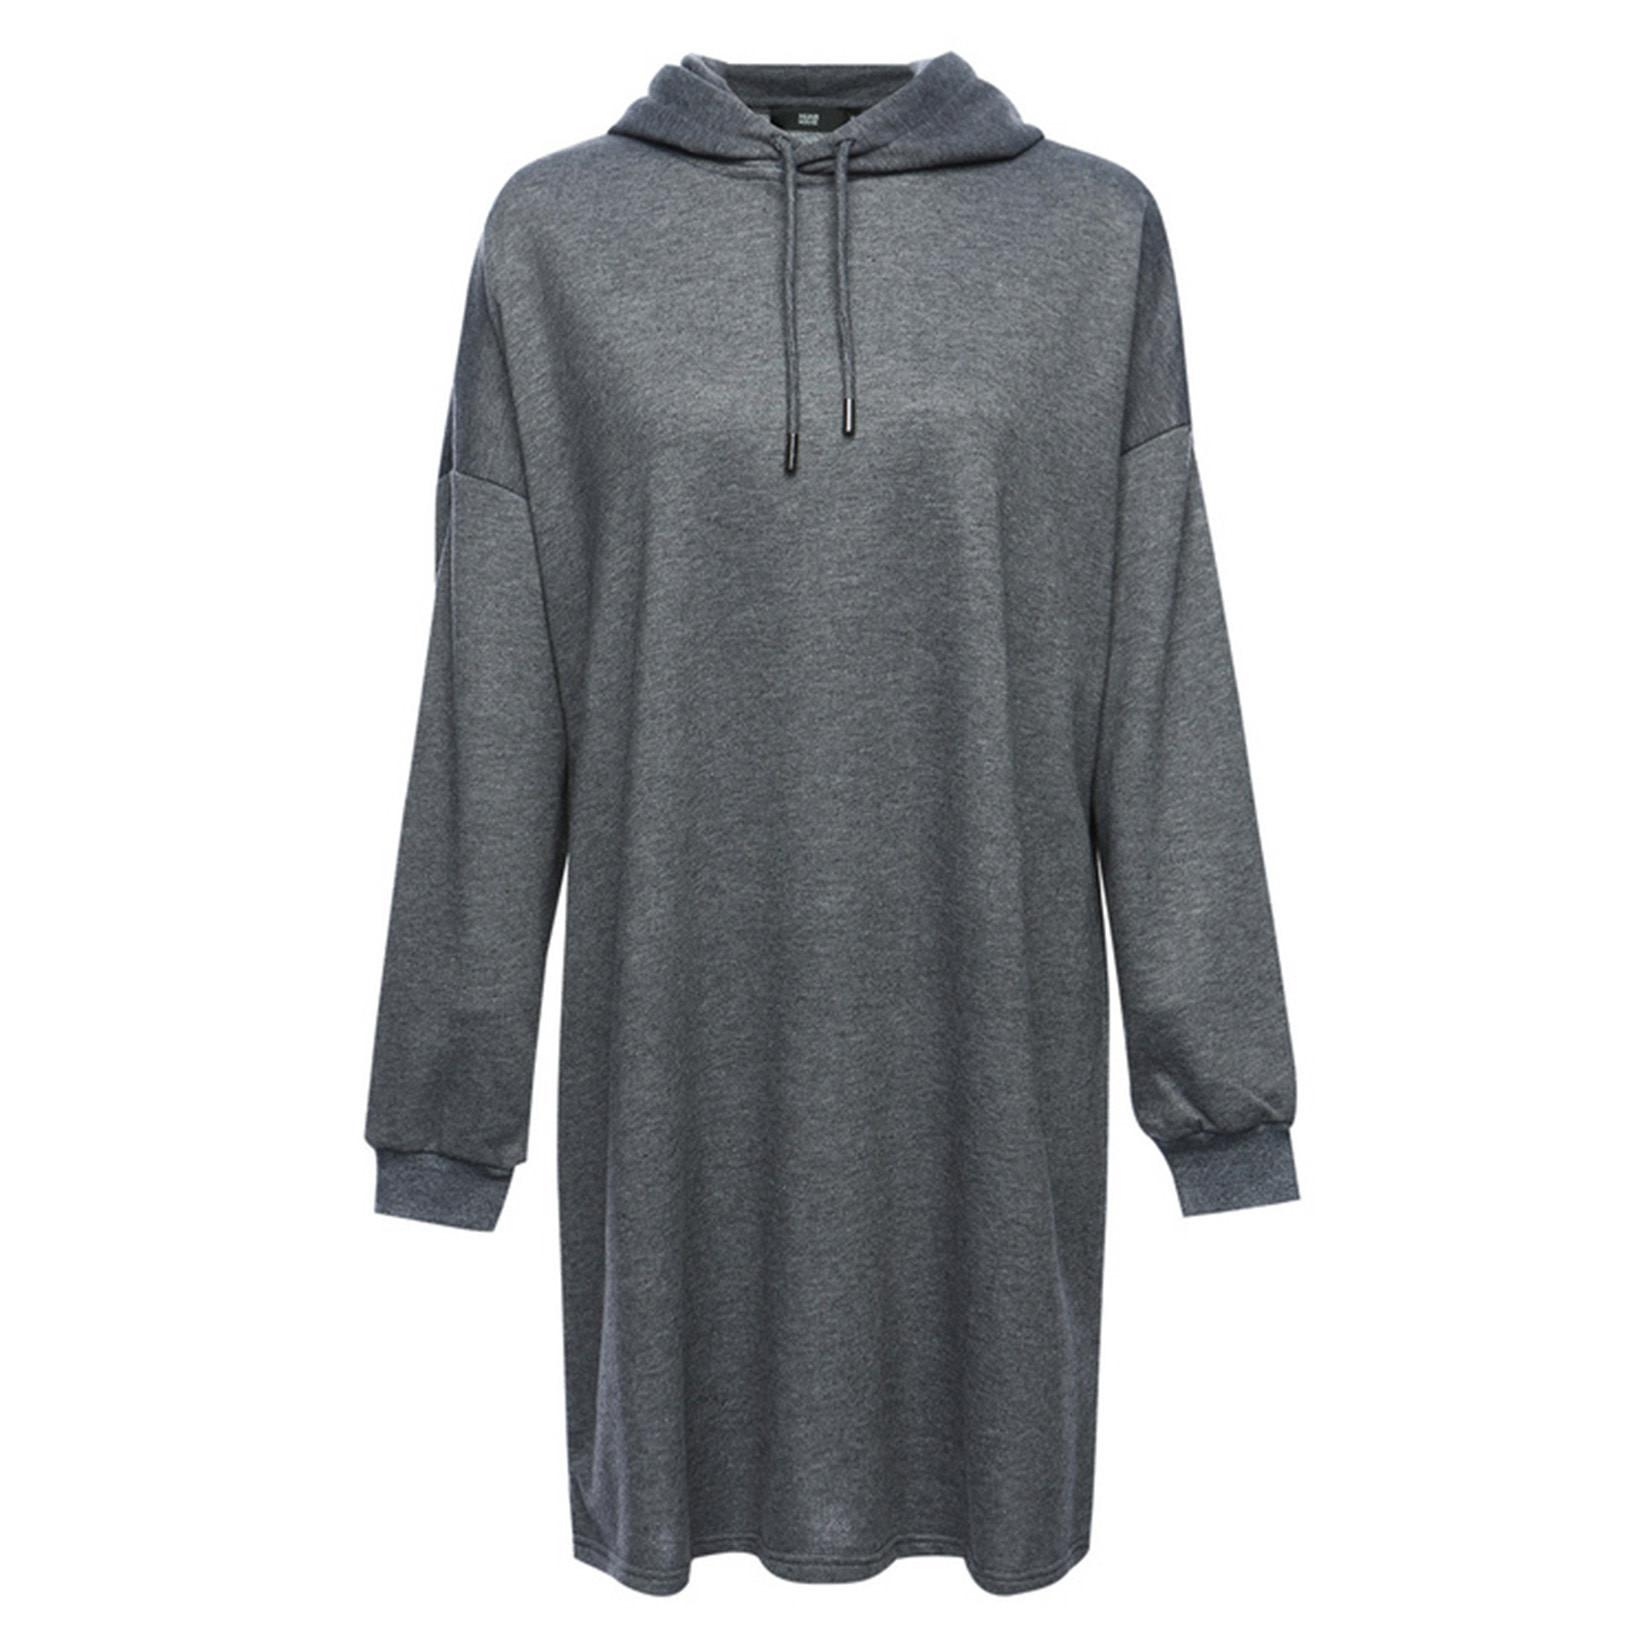 Hijab House Grey Long Hoodie